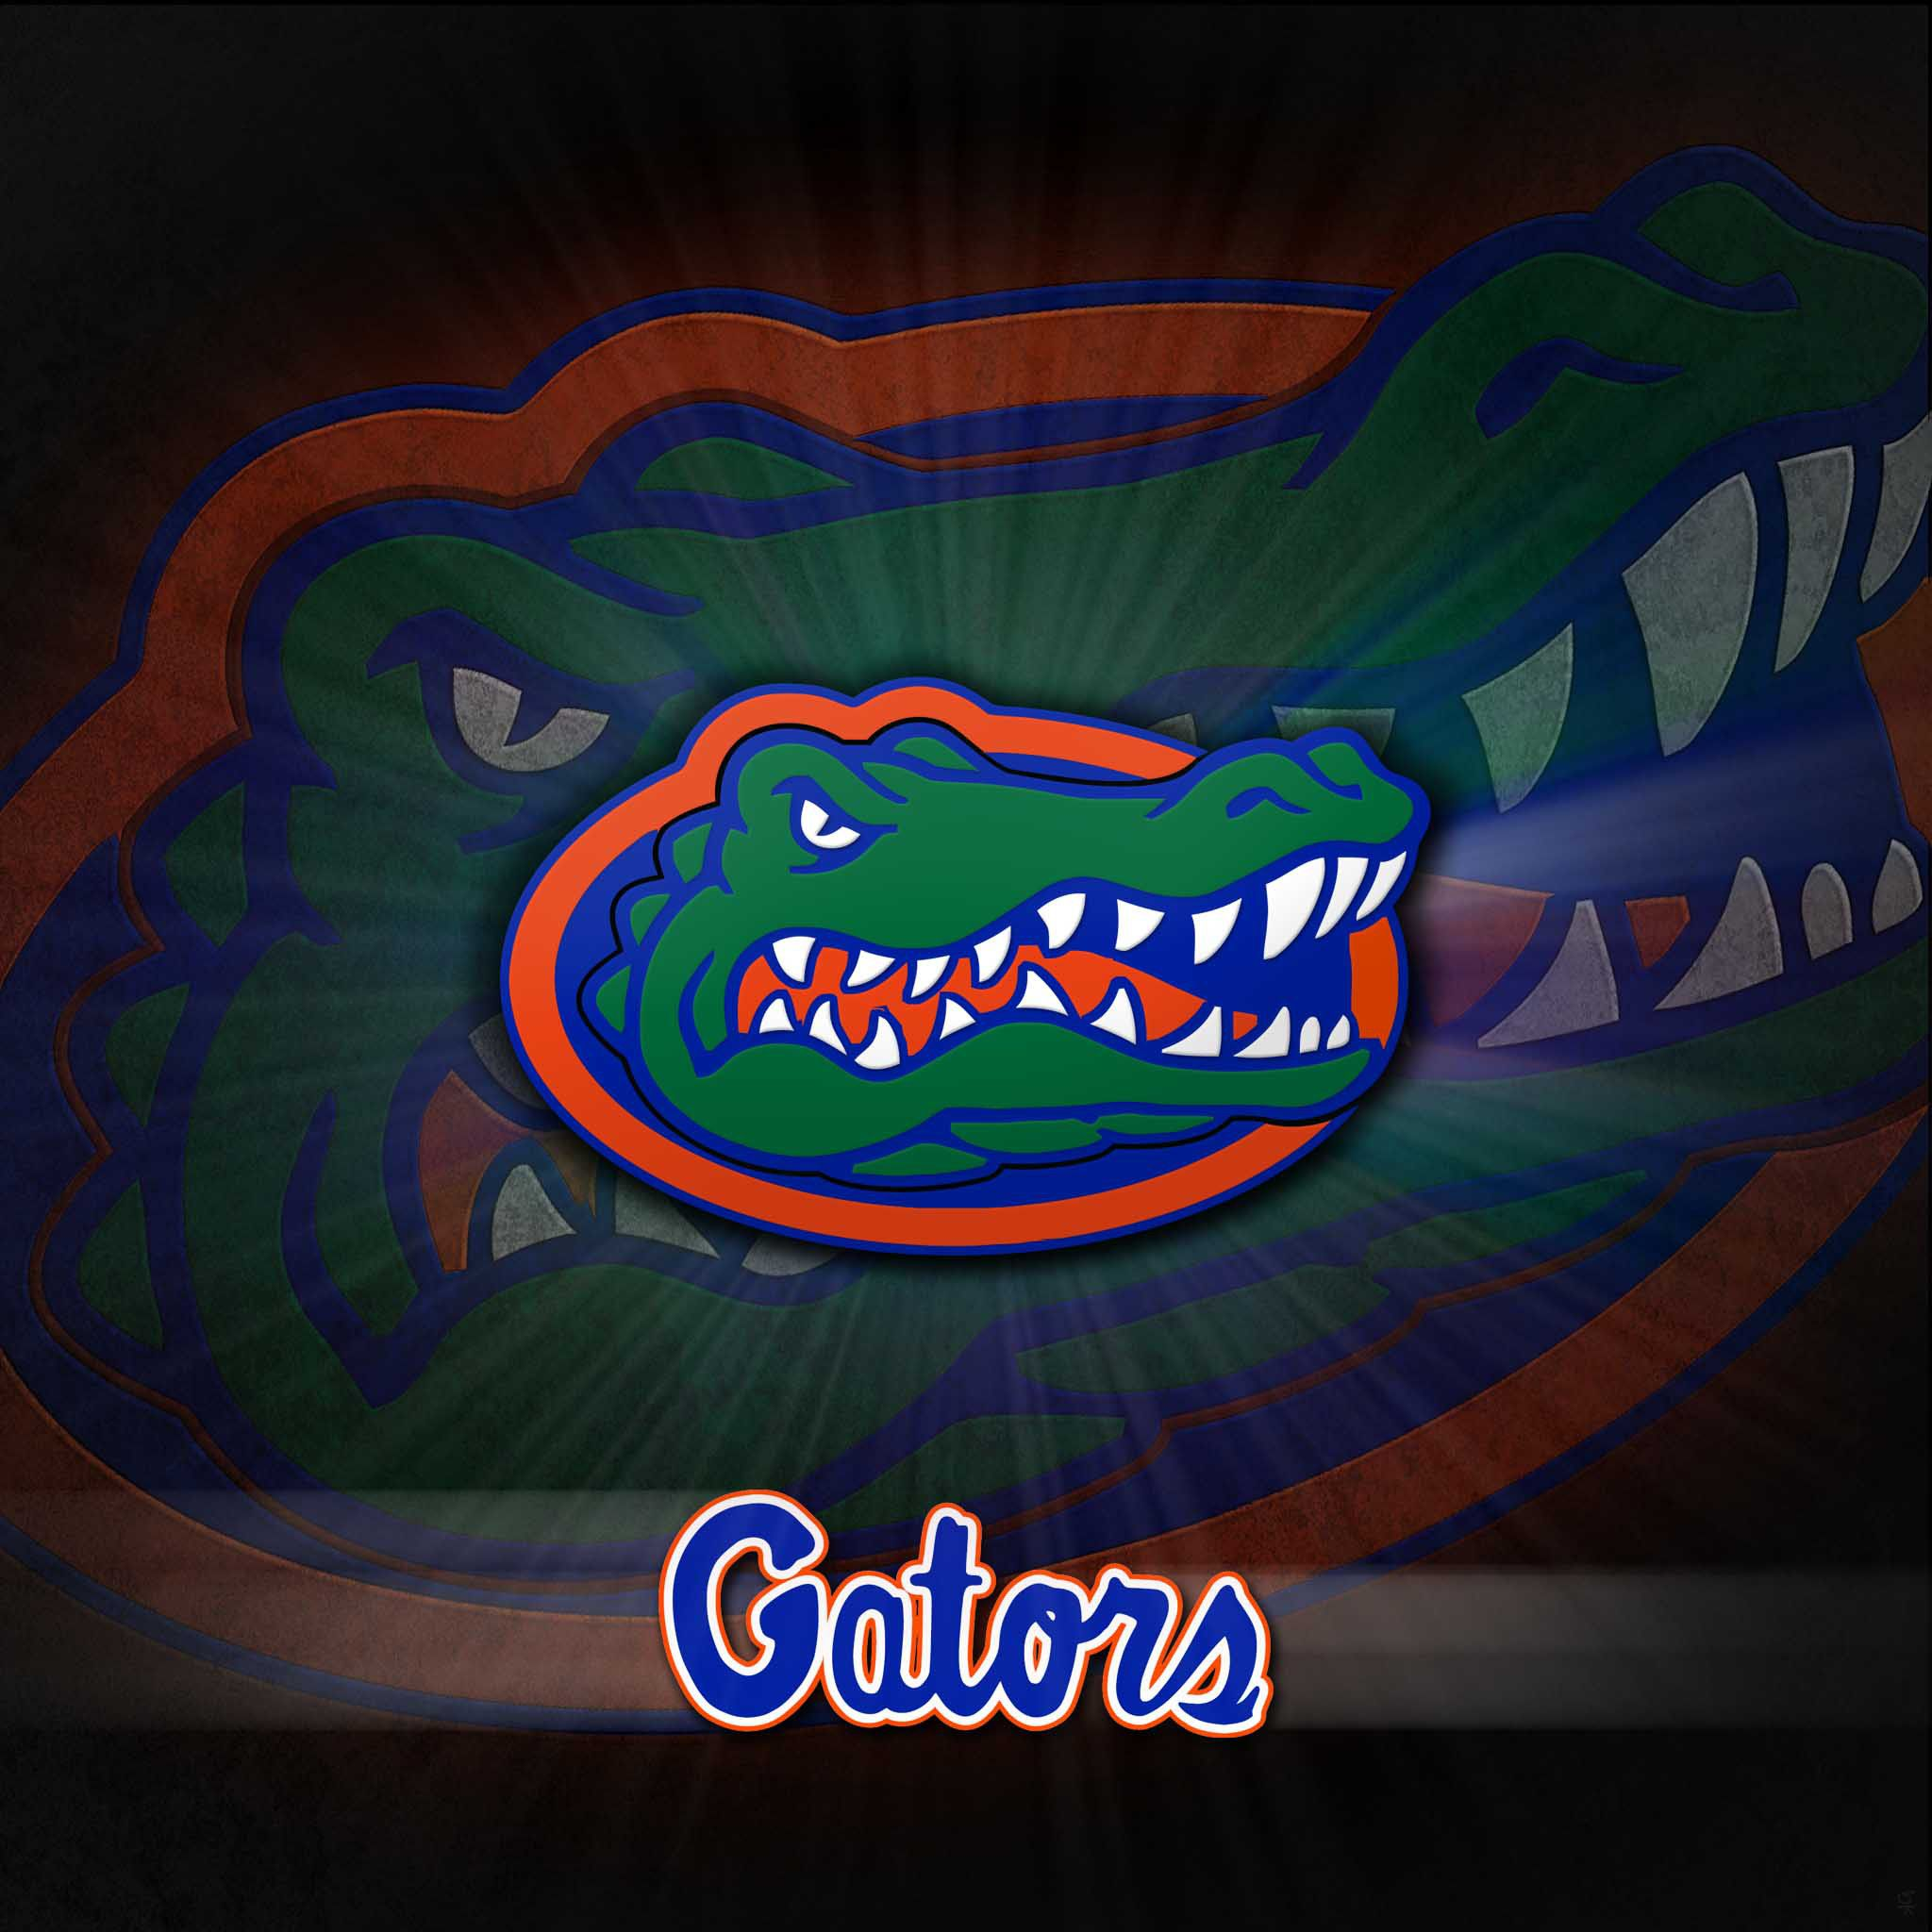 Florida Gators Wallpapers Top Free Florida Gators Backgrounds